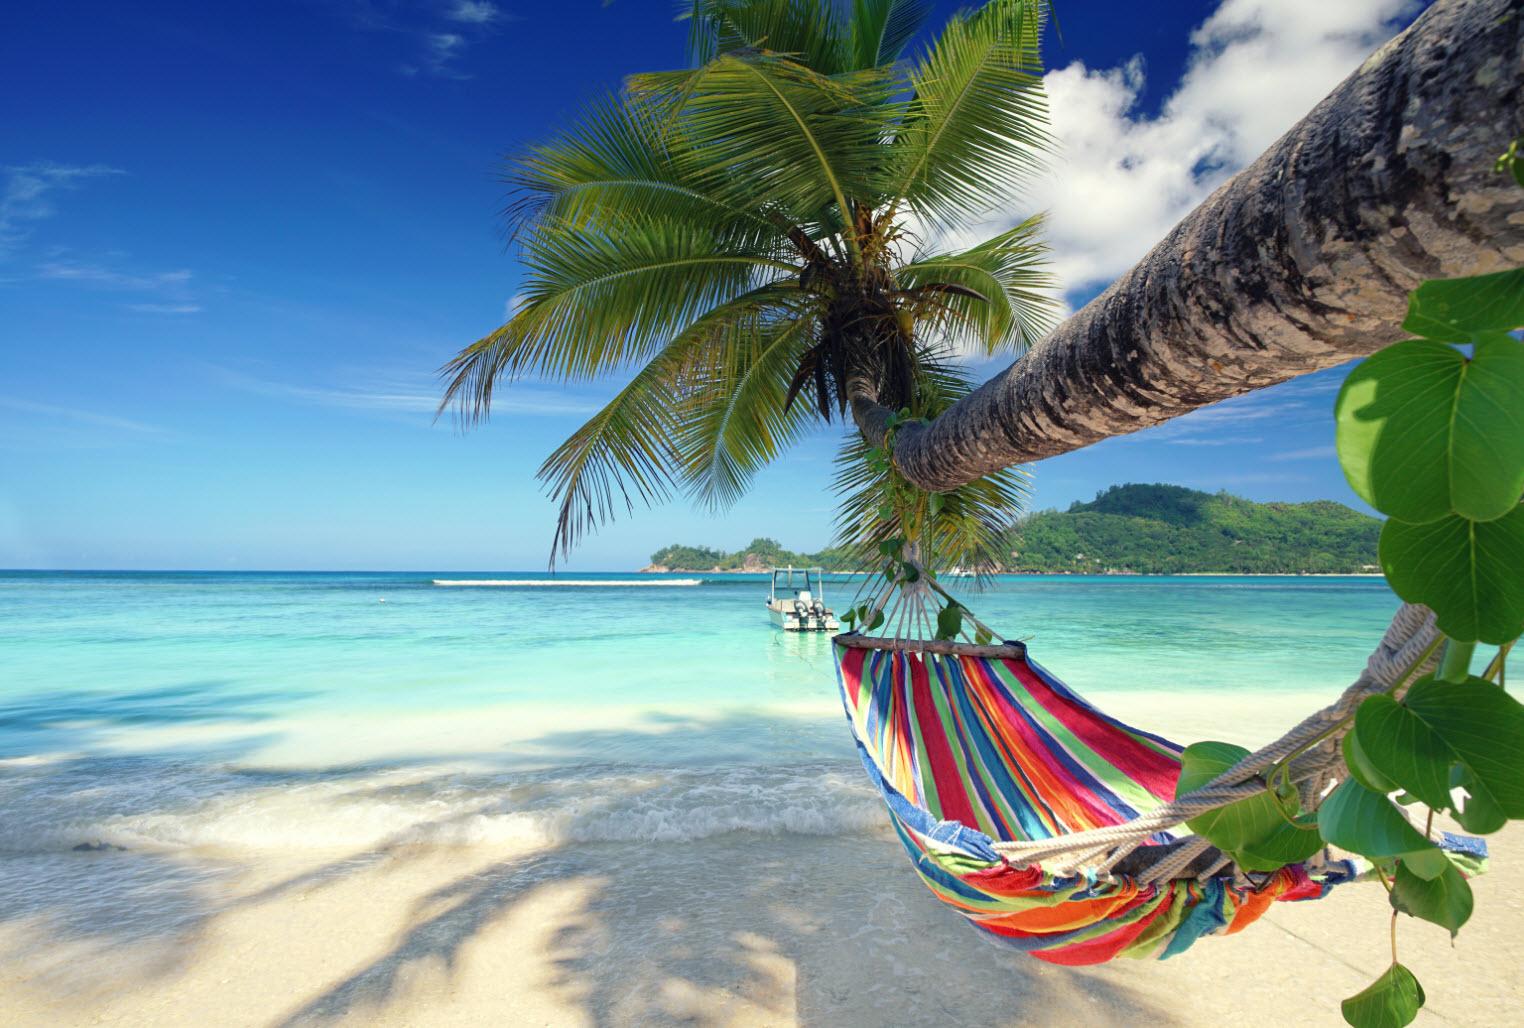 rajskij-ostrov-1.jpg